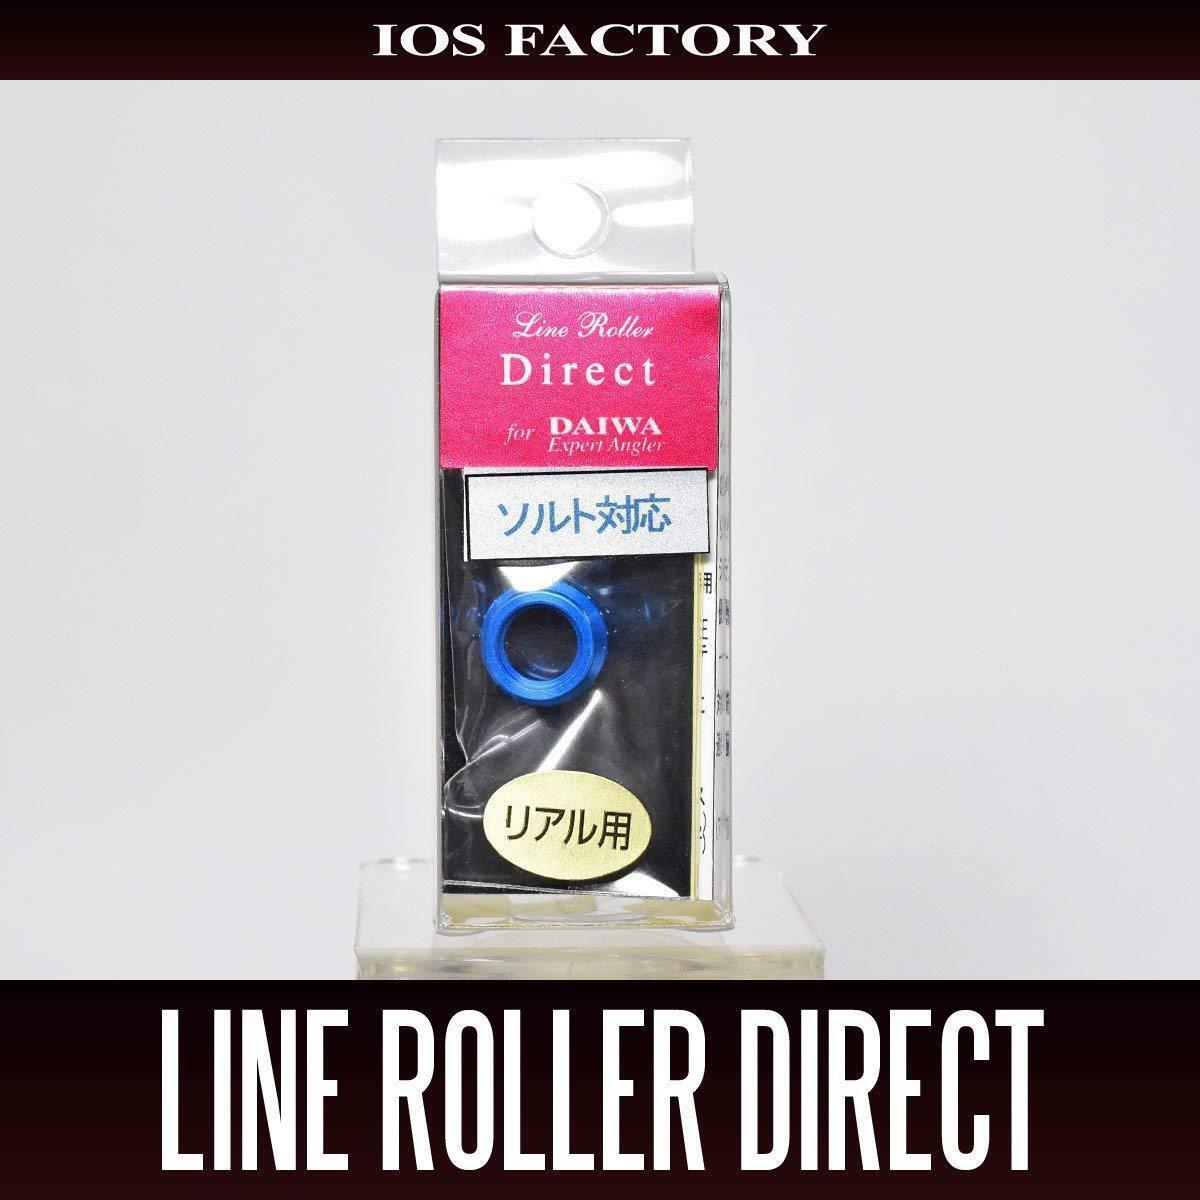 IOS FACTORY Line Roller Direct Blau for DAIWA REAL-TYPE Blau Direct 39b44e